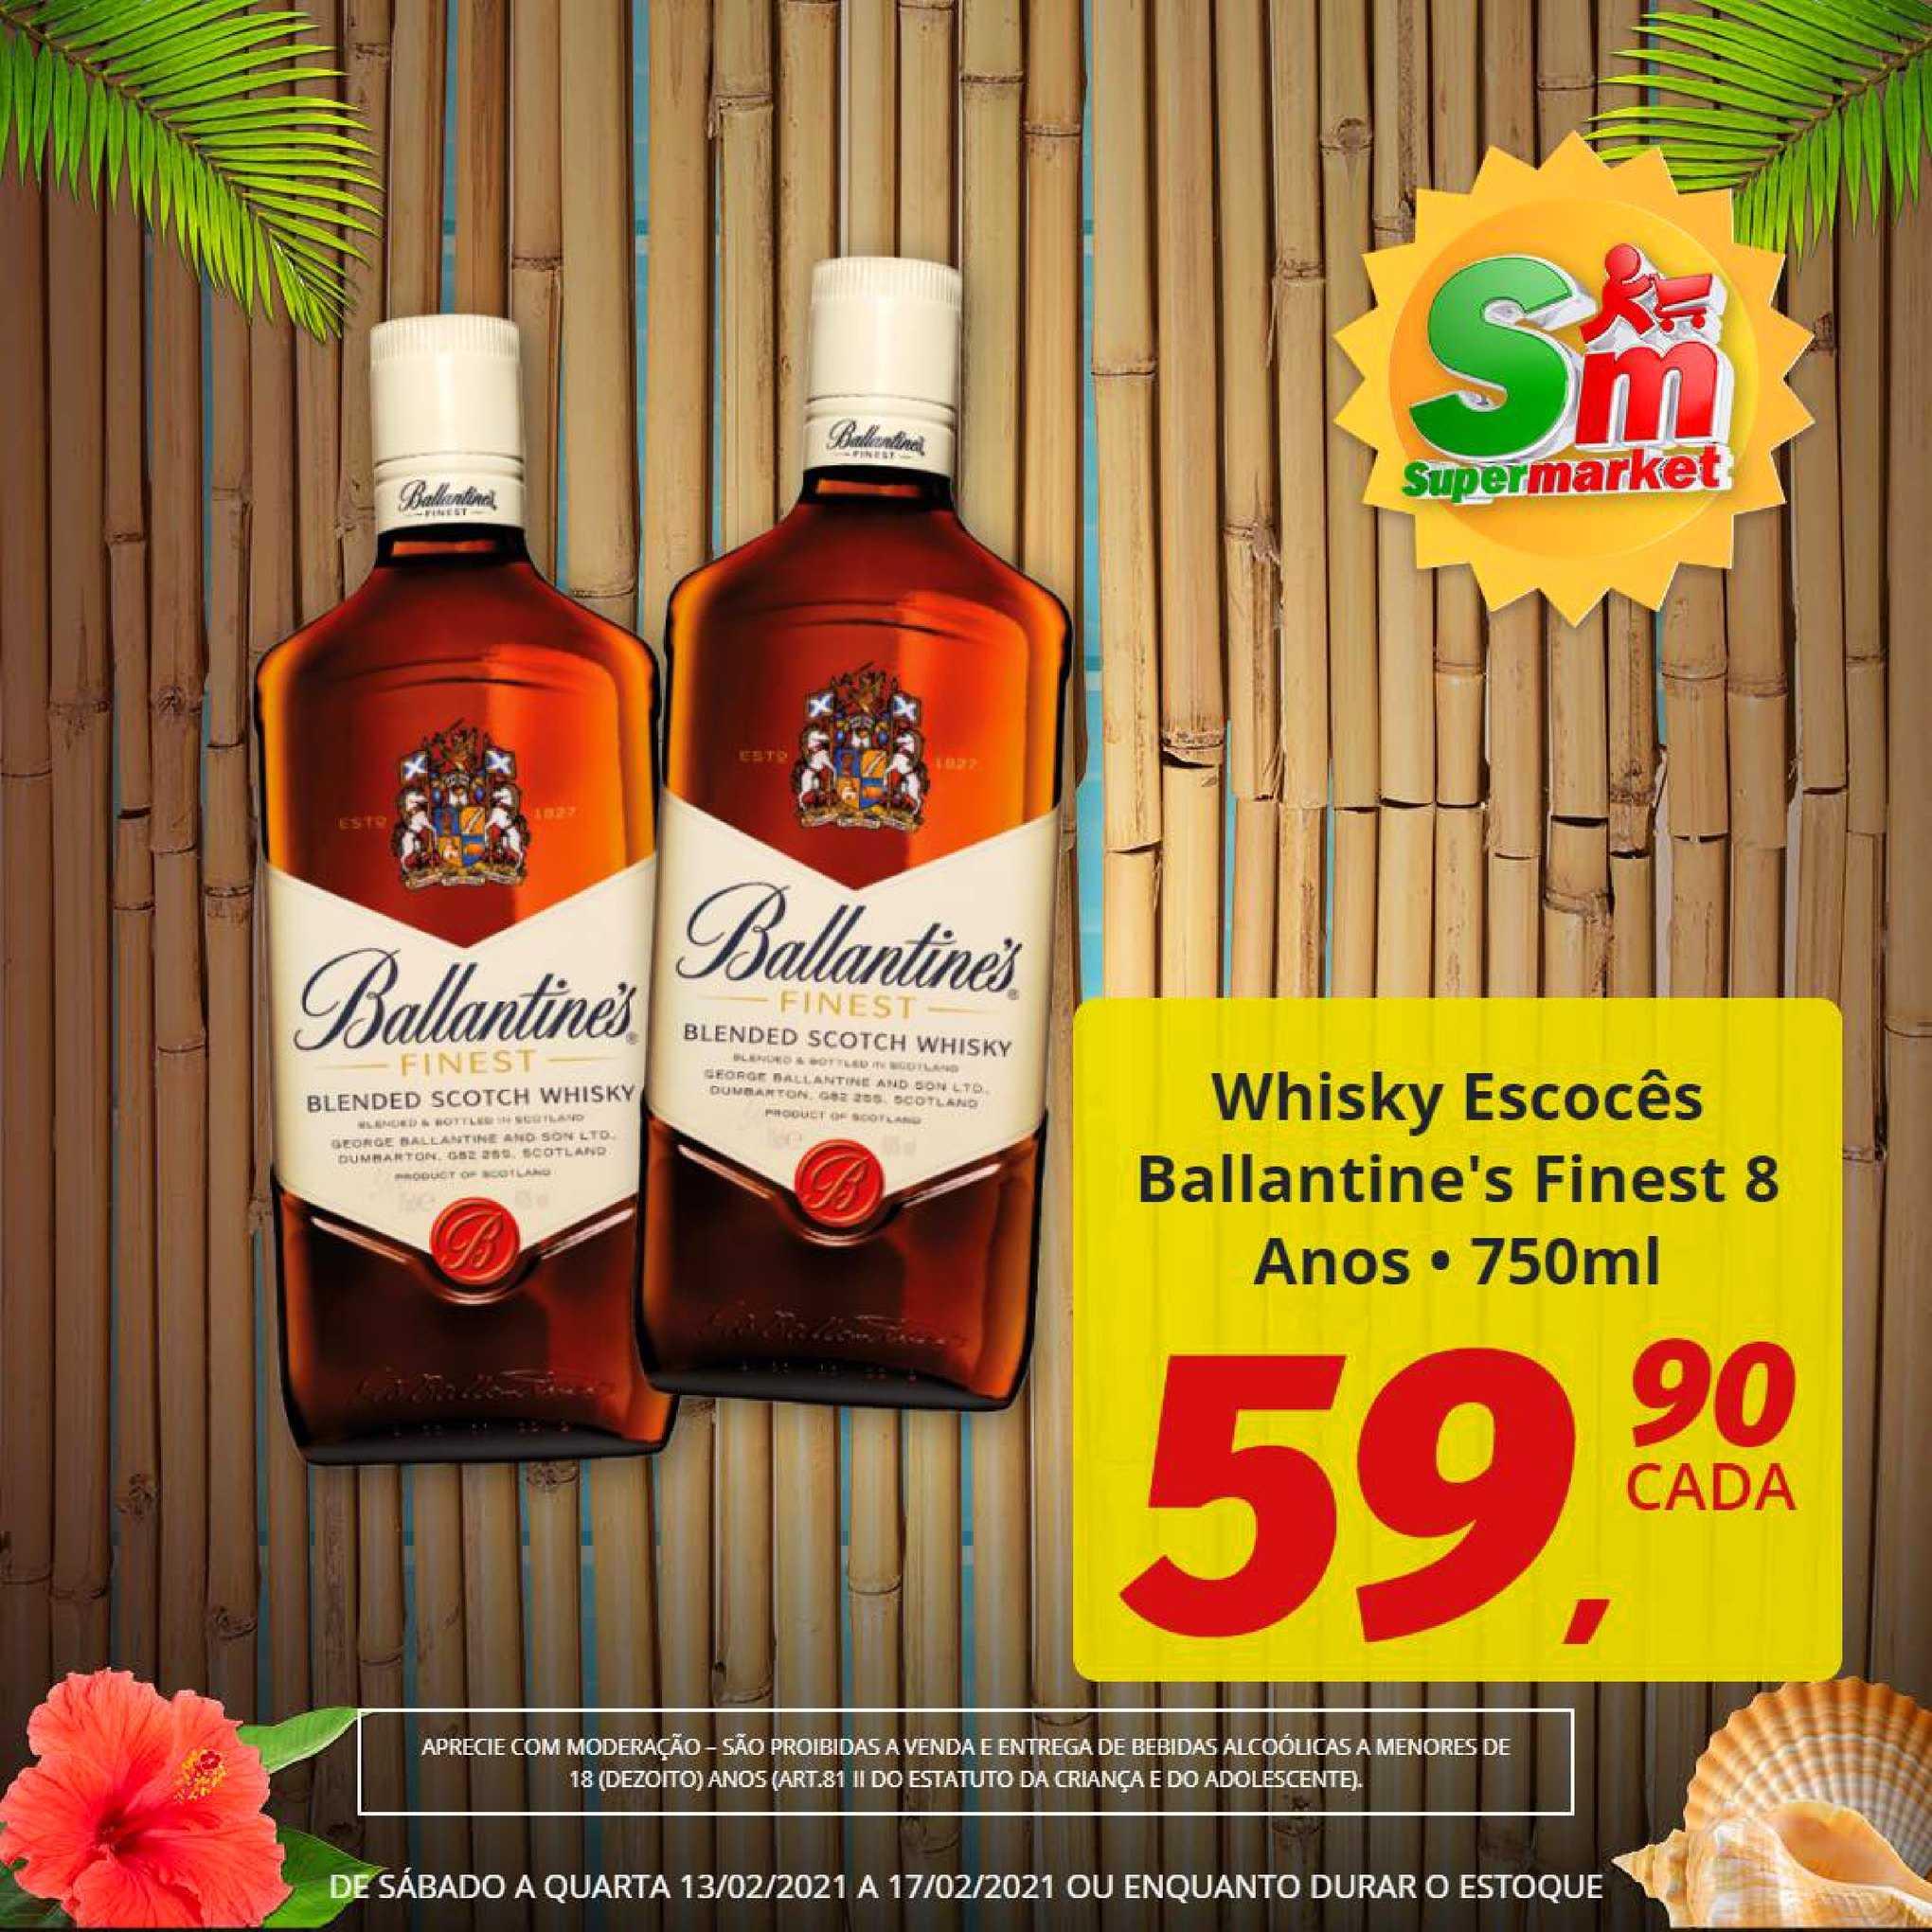 Rede Supermarket Whisky Escocês Ballantine's Finest